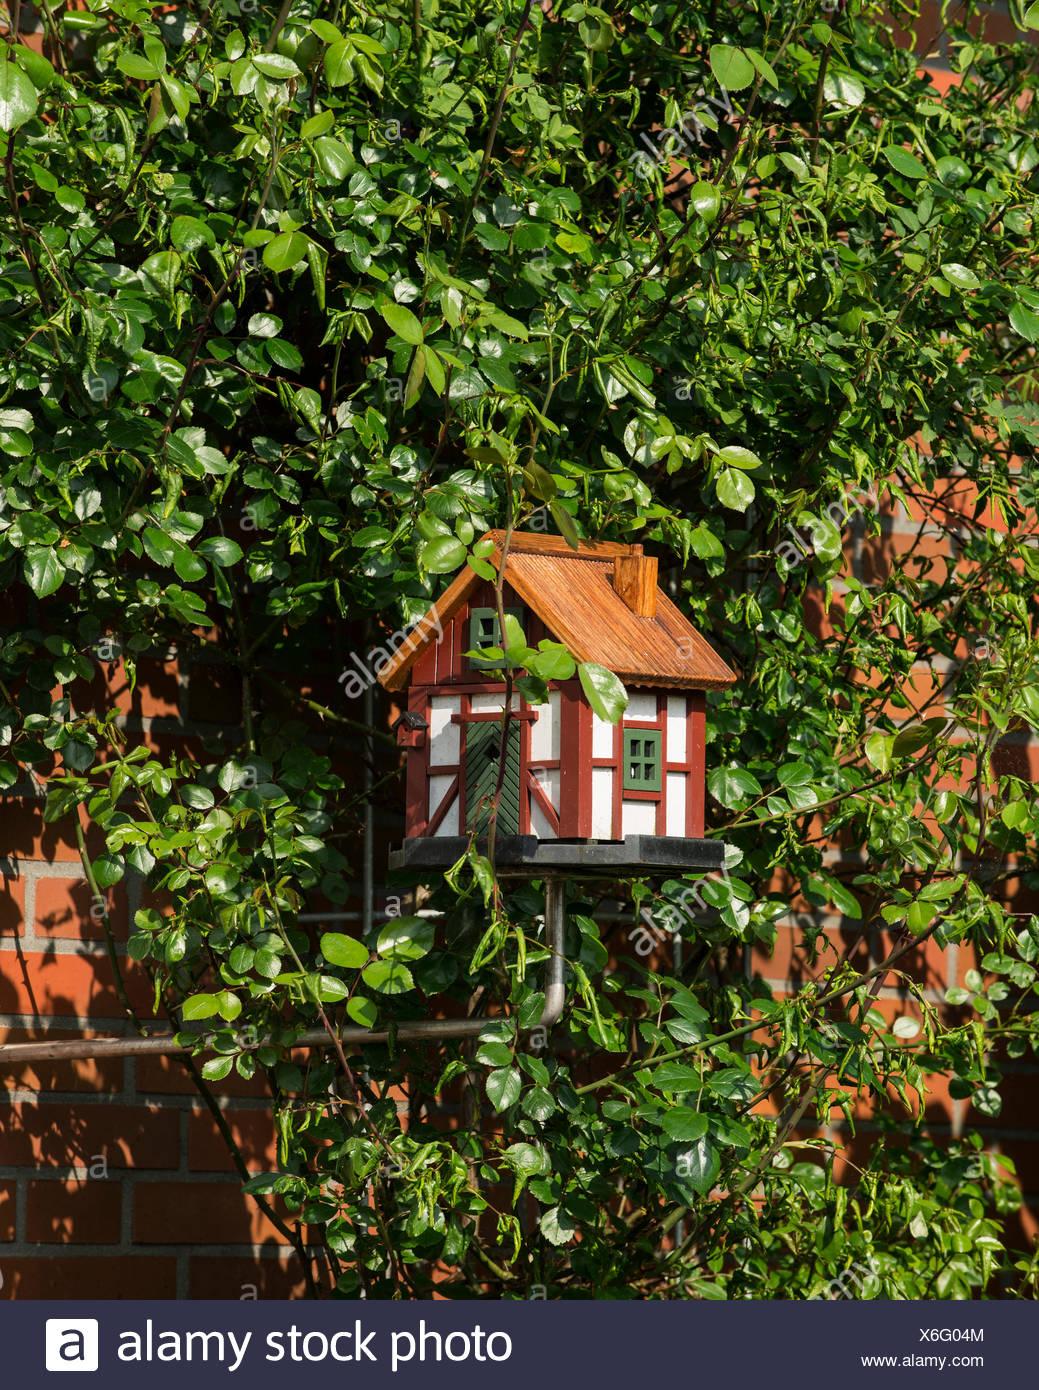 Garden Ornament, Bird House In A Rosebush Trellis Against A House Wall,  Lower Saxony